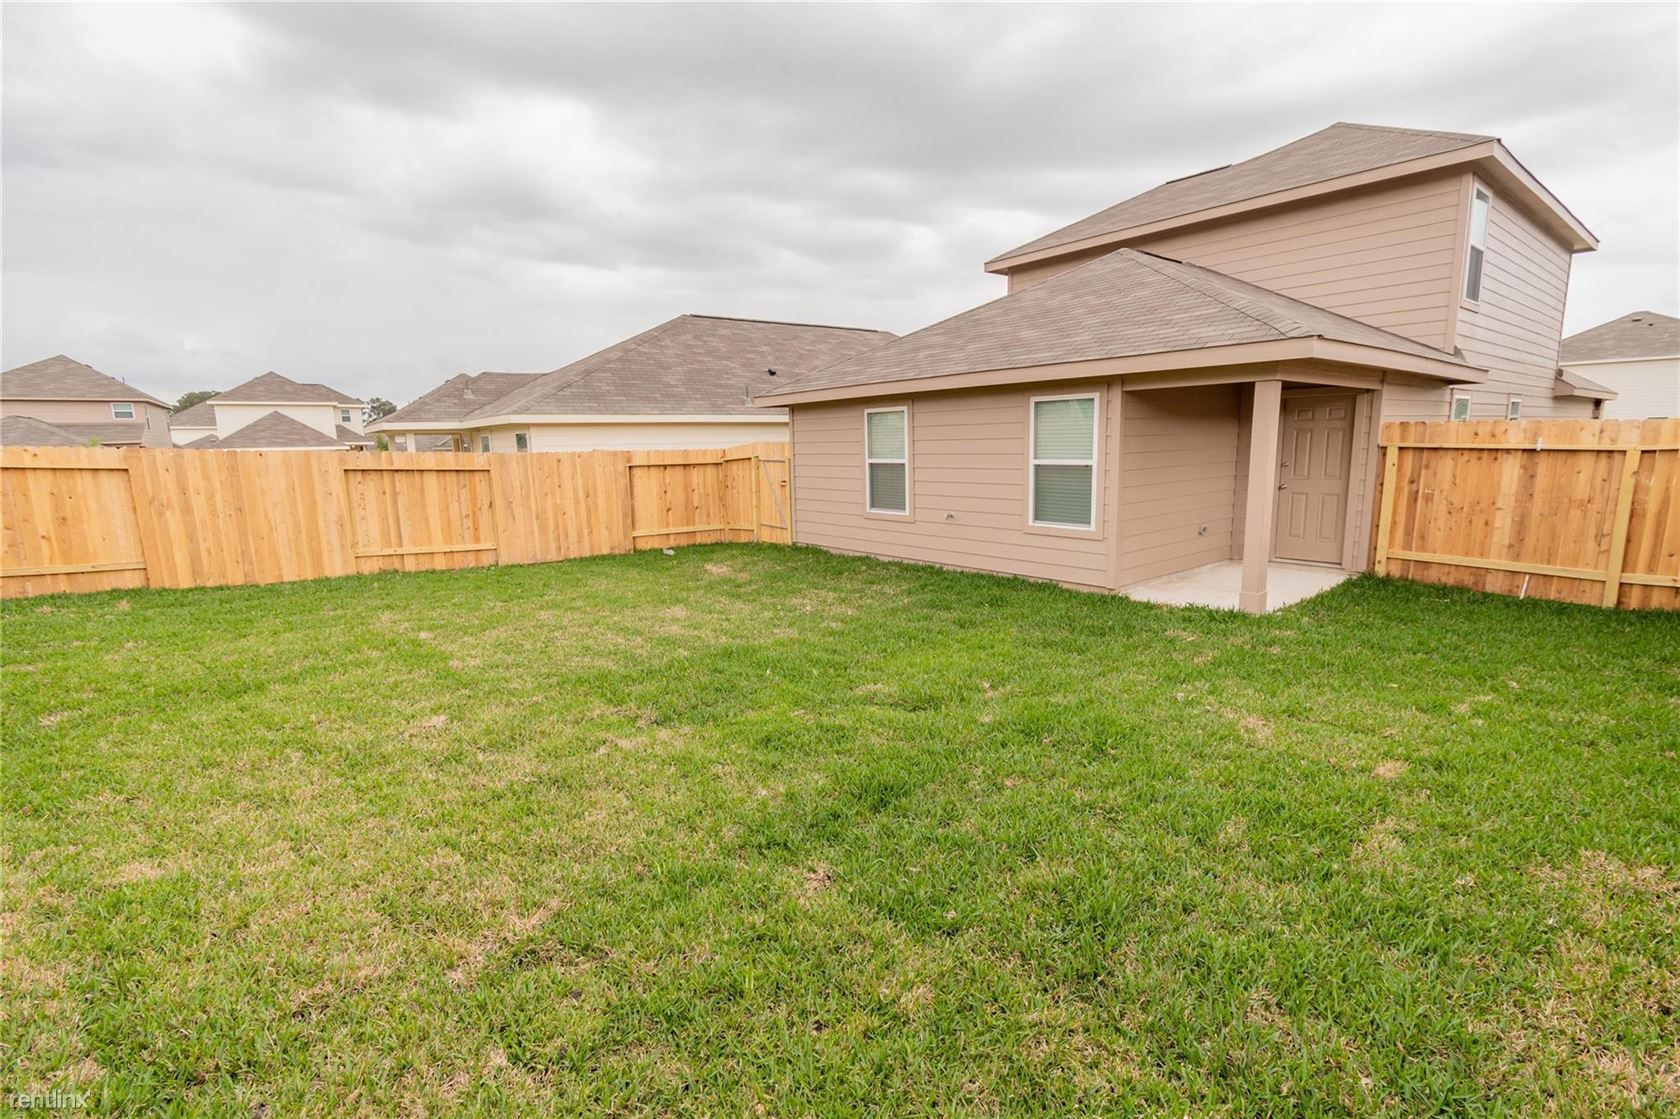 508 Meadow Park Ln, Willis, TX - $1,515